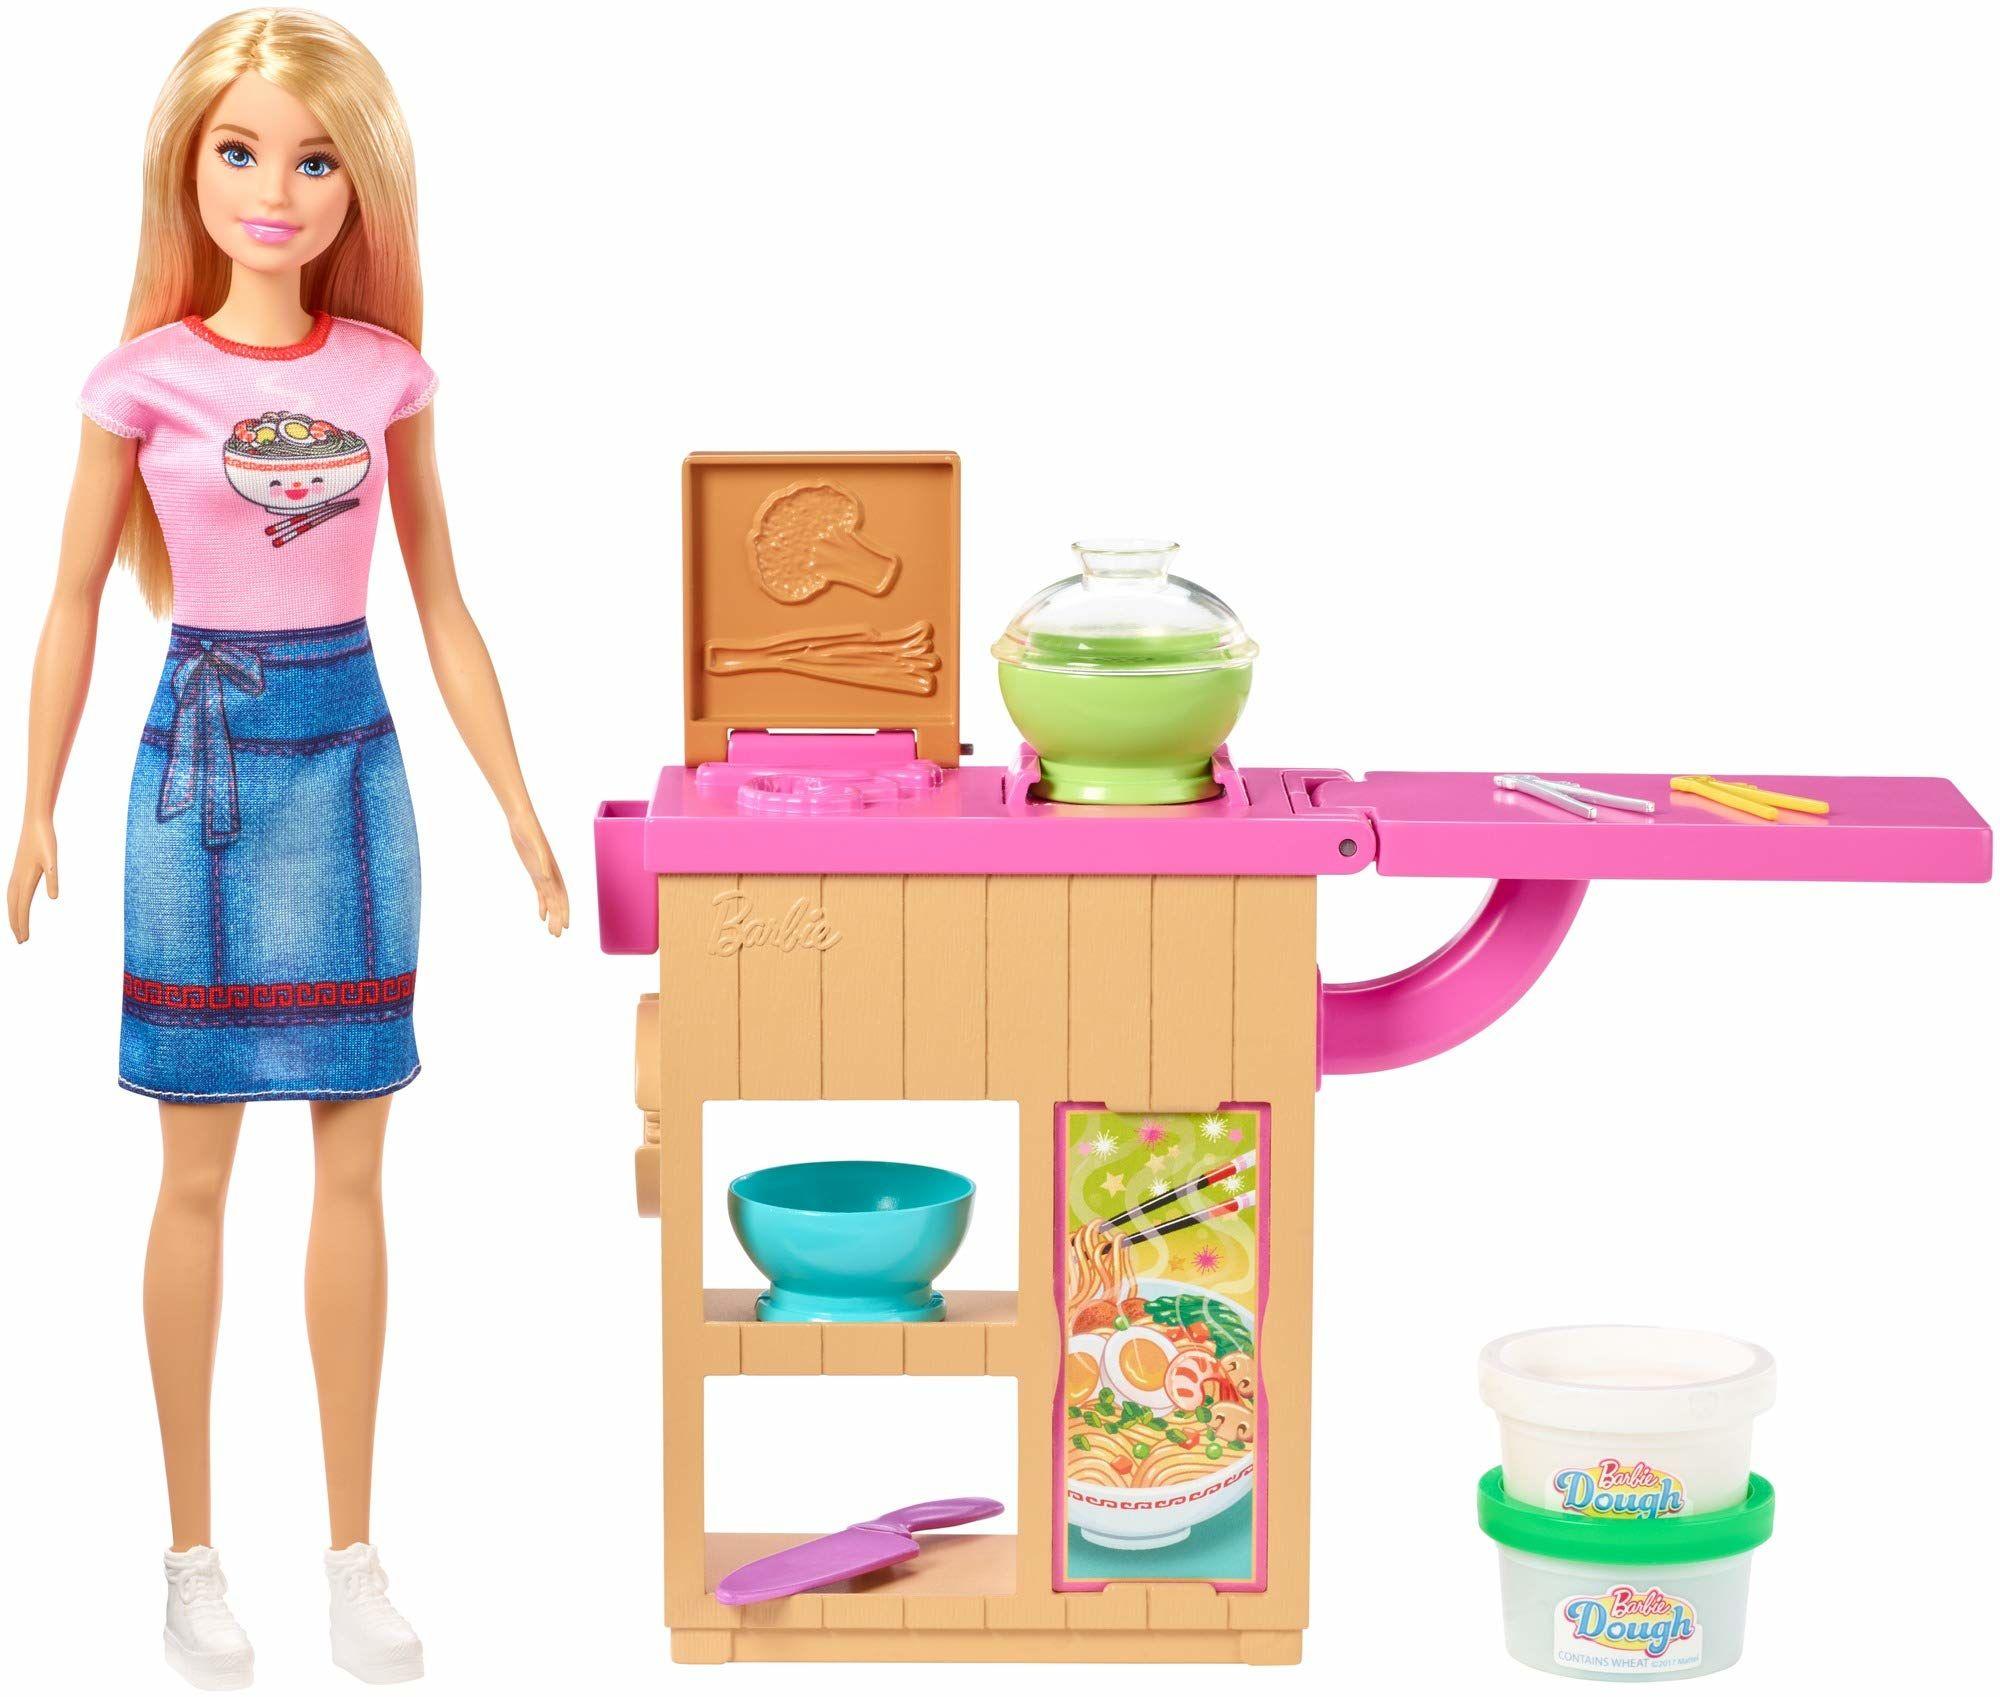 Barbie GHK43 Maker lalka i zestaw do robienia makaronu